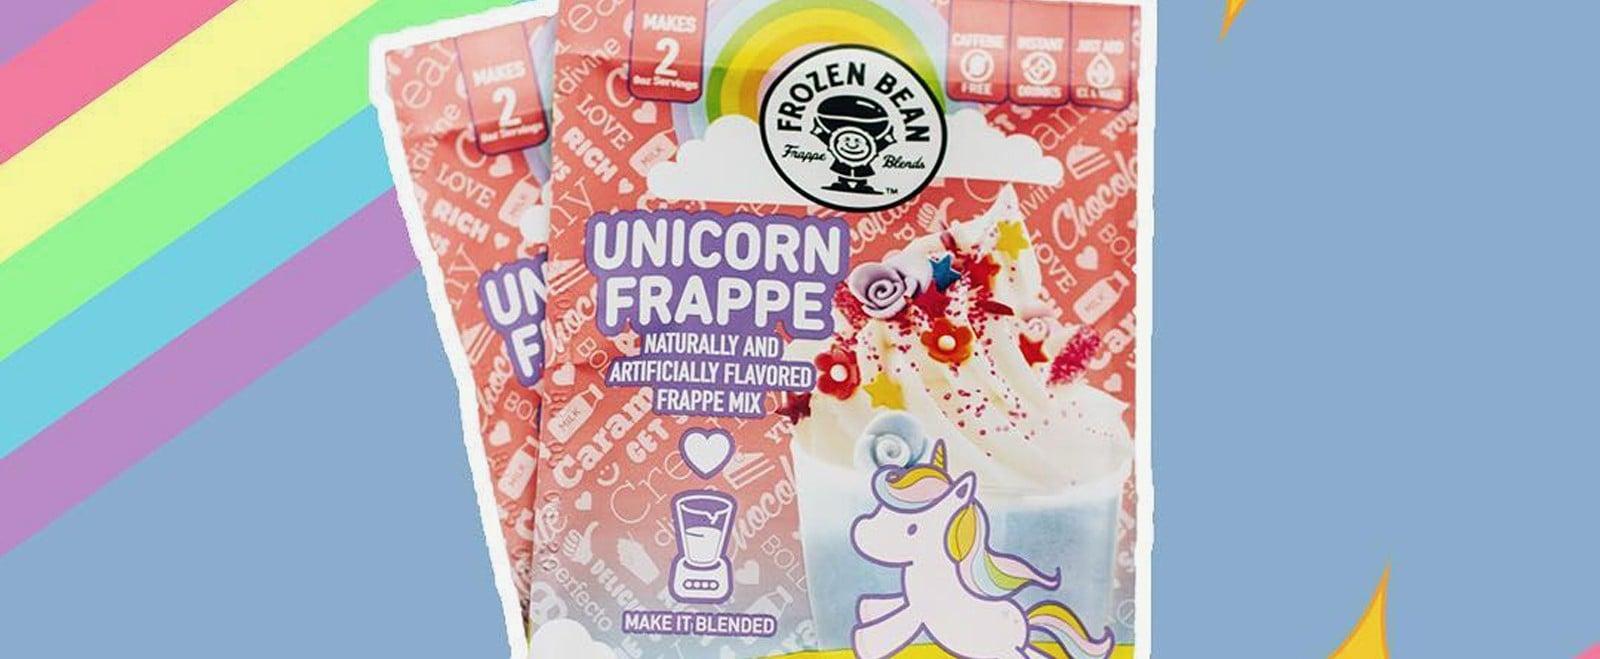 Frozen Bean Unicorn Frappe Mix at Walmart